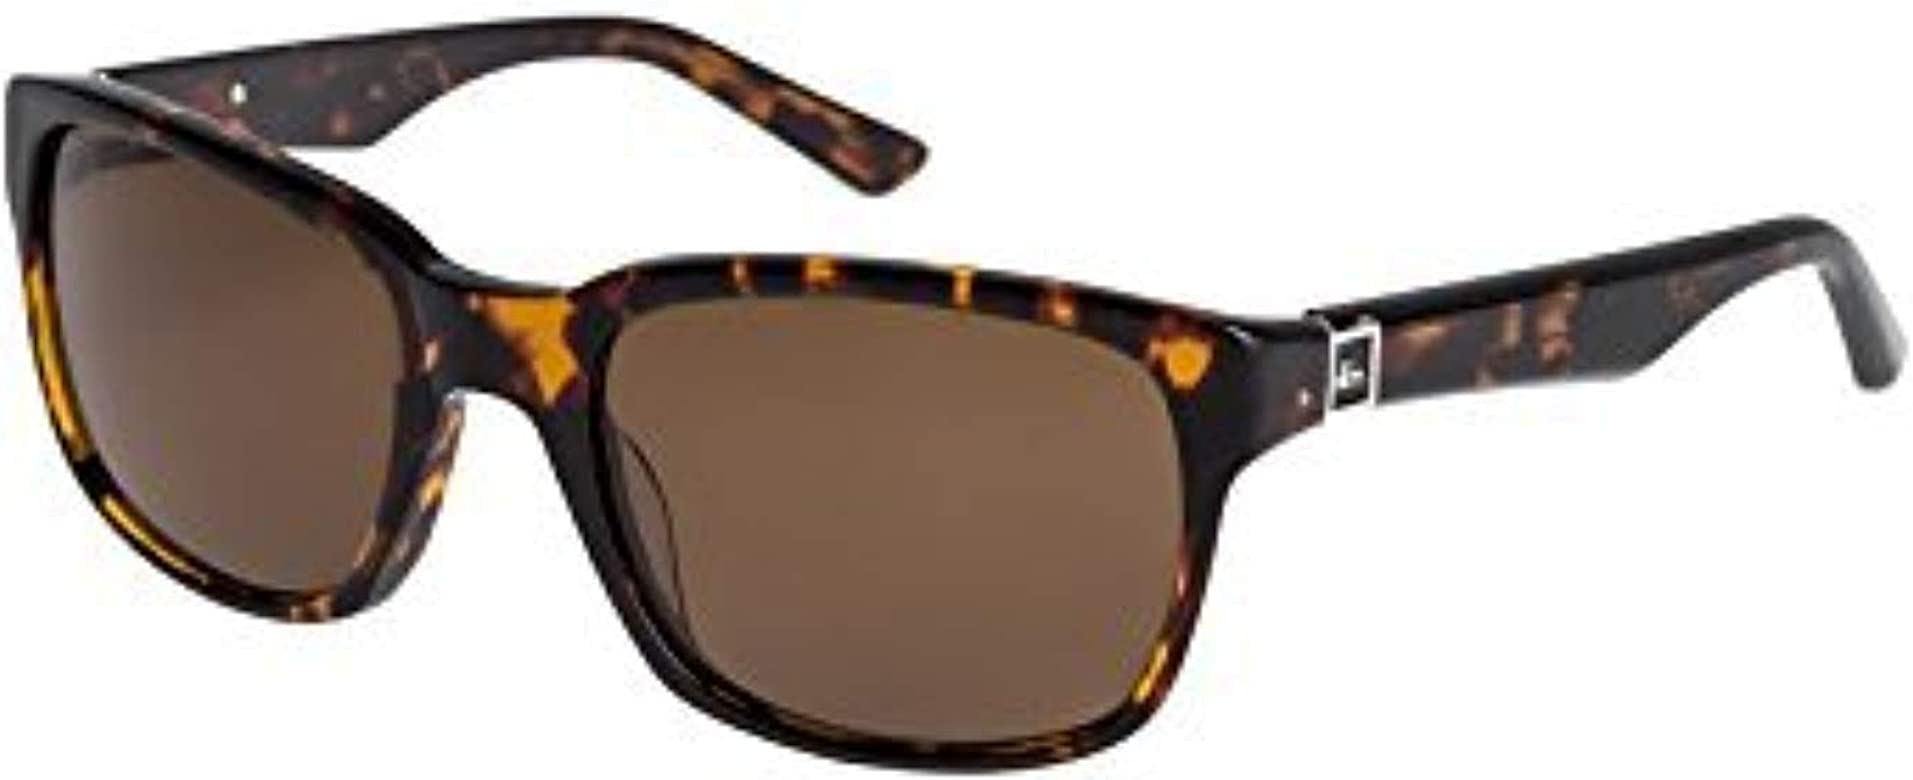 Quiksilver Gafas de sol - para hombre Tortoise/Brown Talla ...